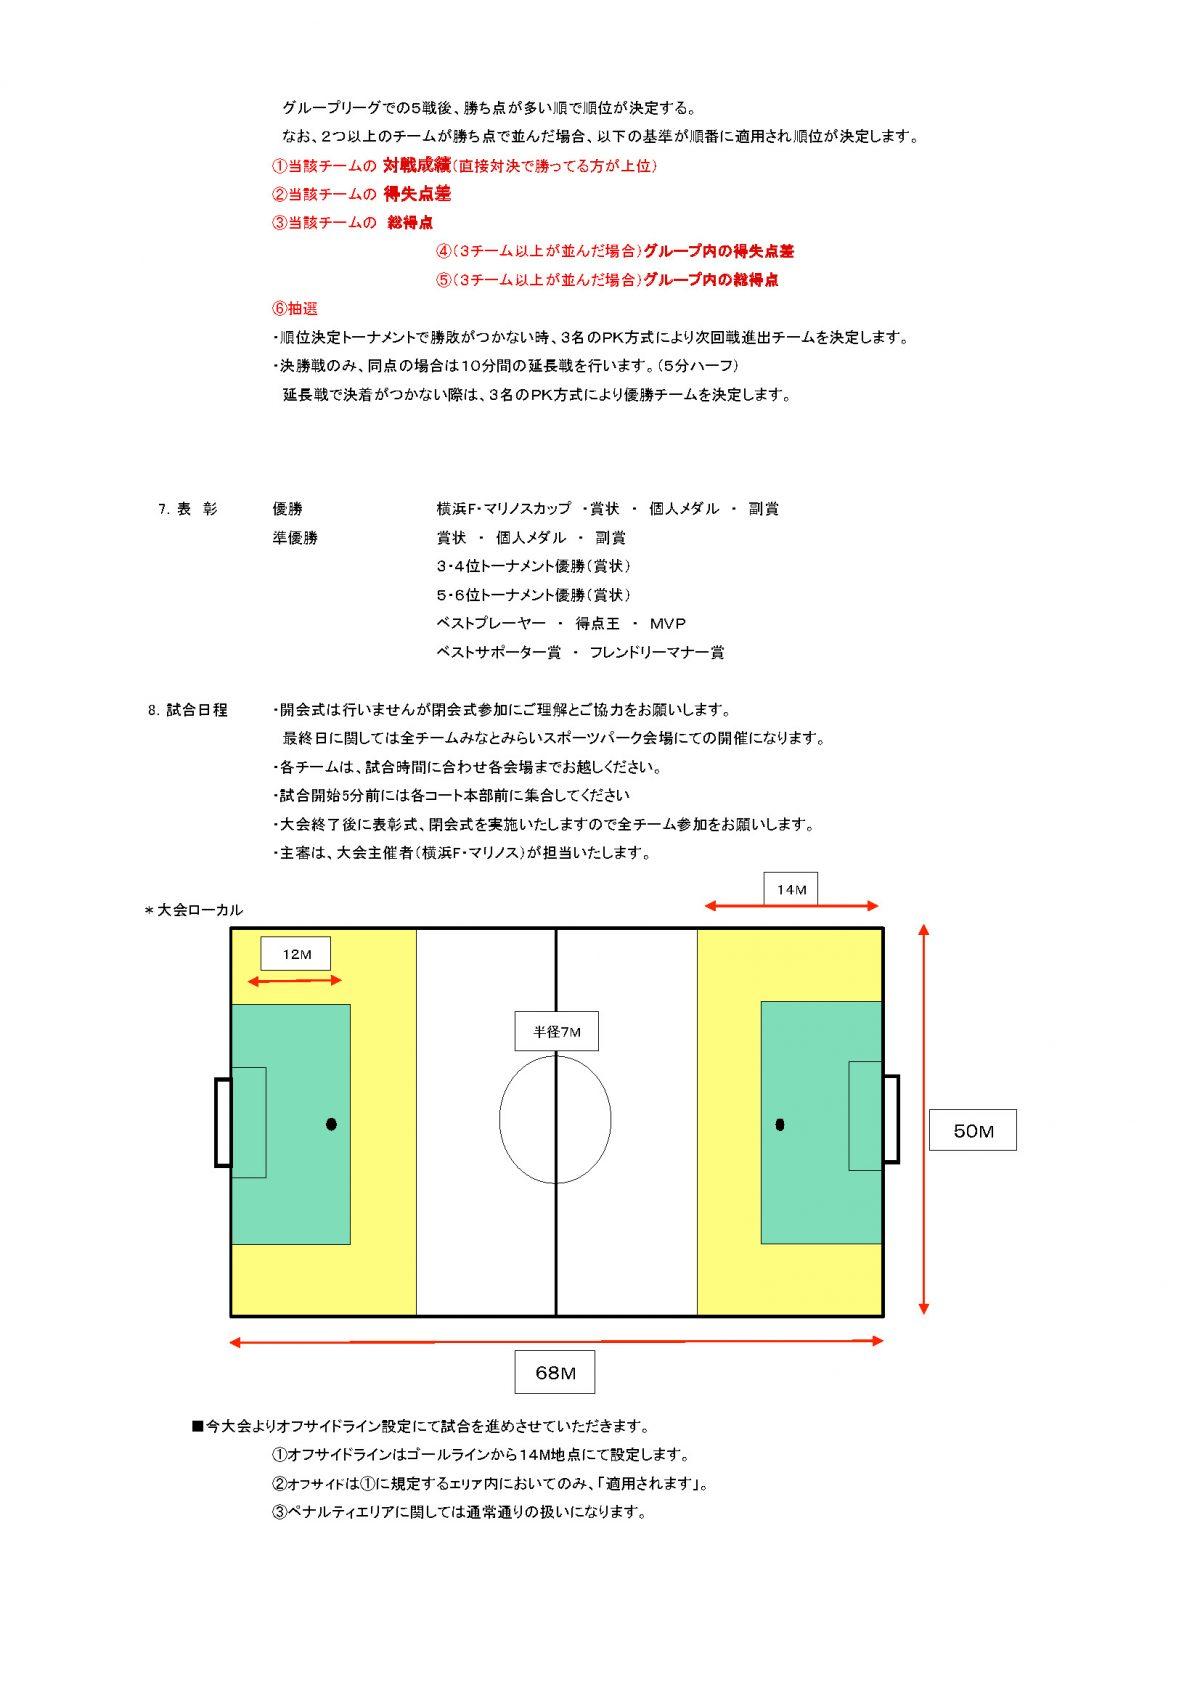 9e8ff73c835de445ecf06fd5bf361efd-e1487322155337 第24回プリンシパルホームF・Marinos CUP U-10 GROWGAME 開催のお知らせ